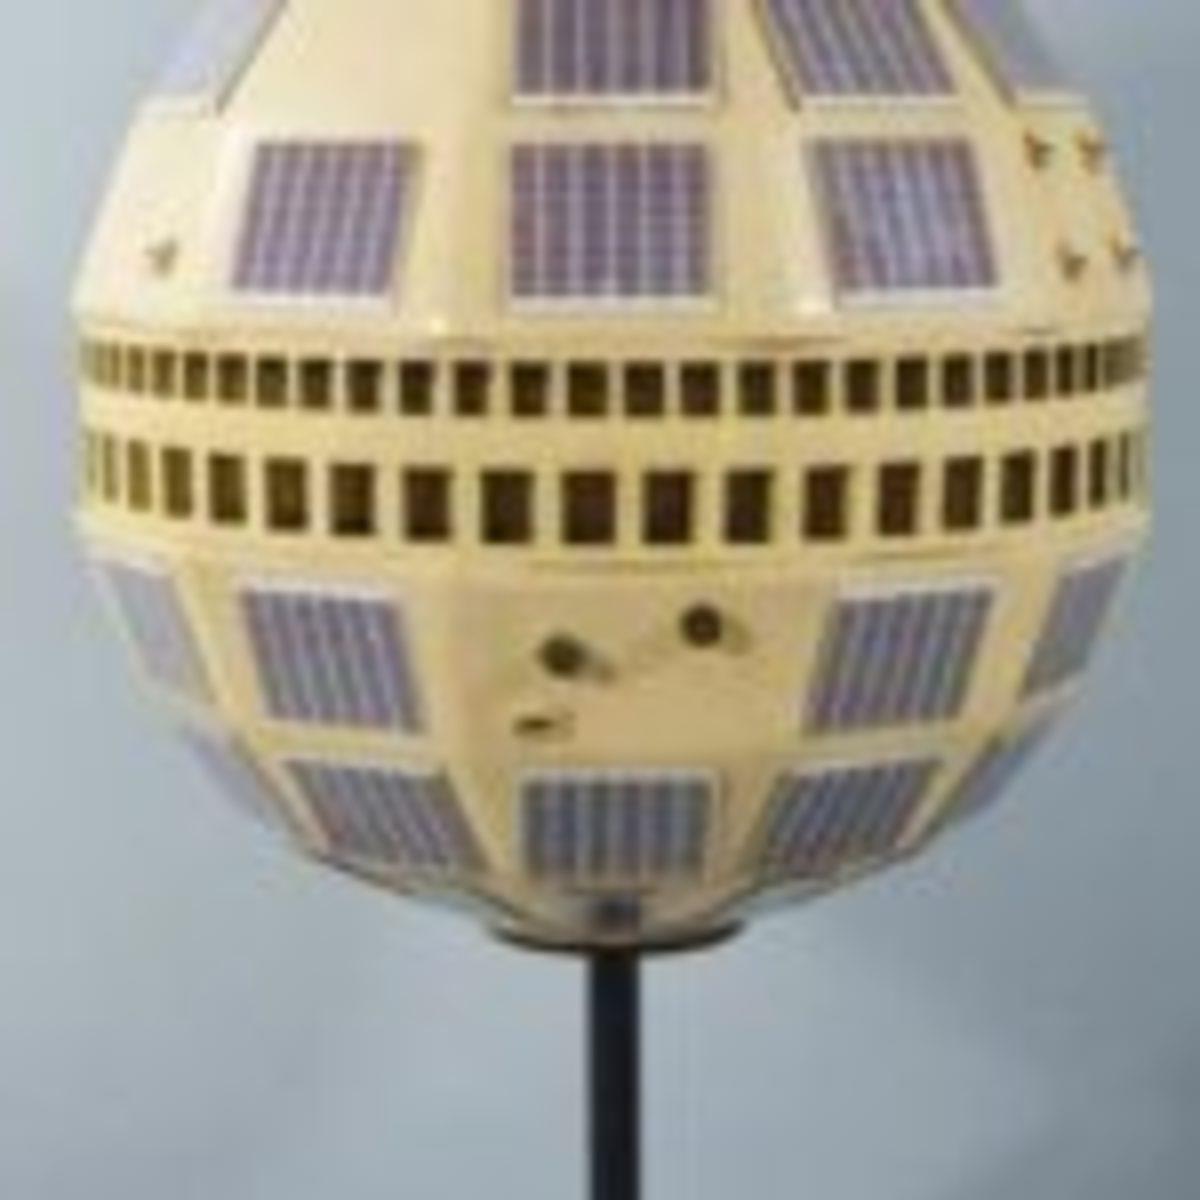 Bell Systems Model of a Telstar Communication Satellite.